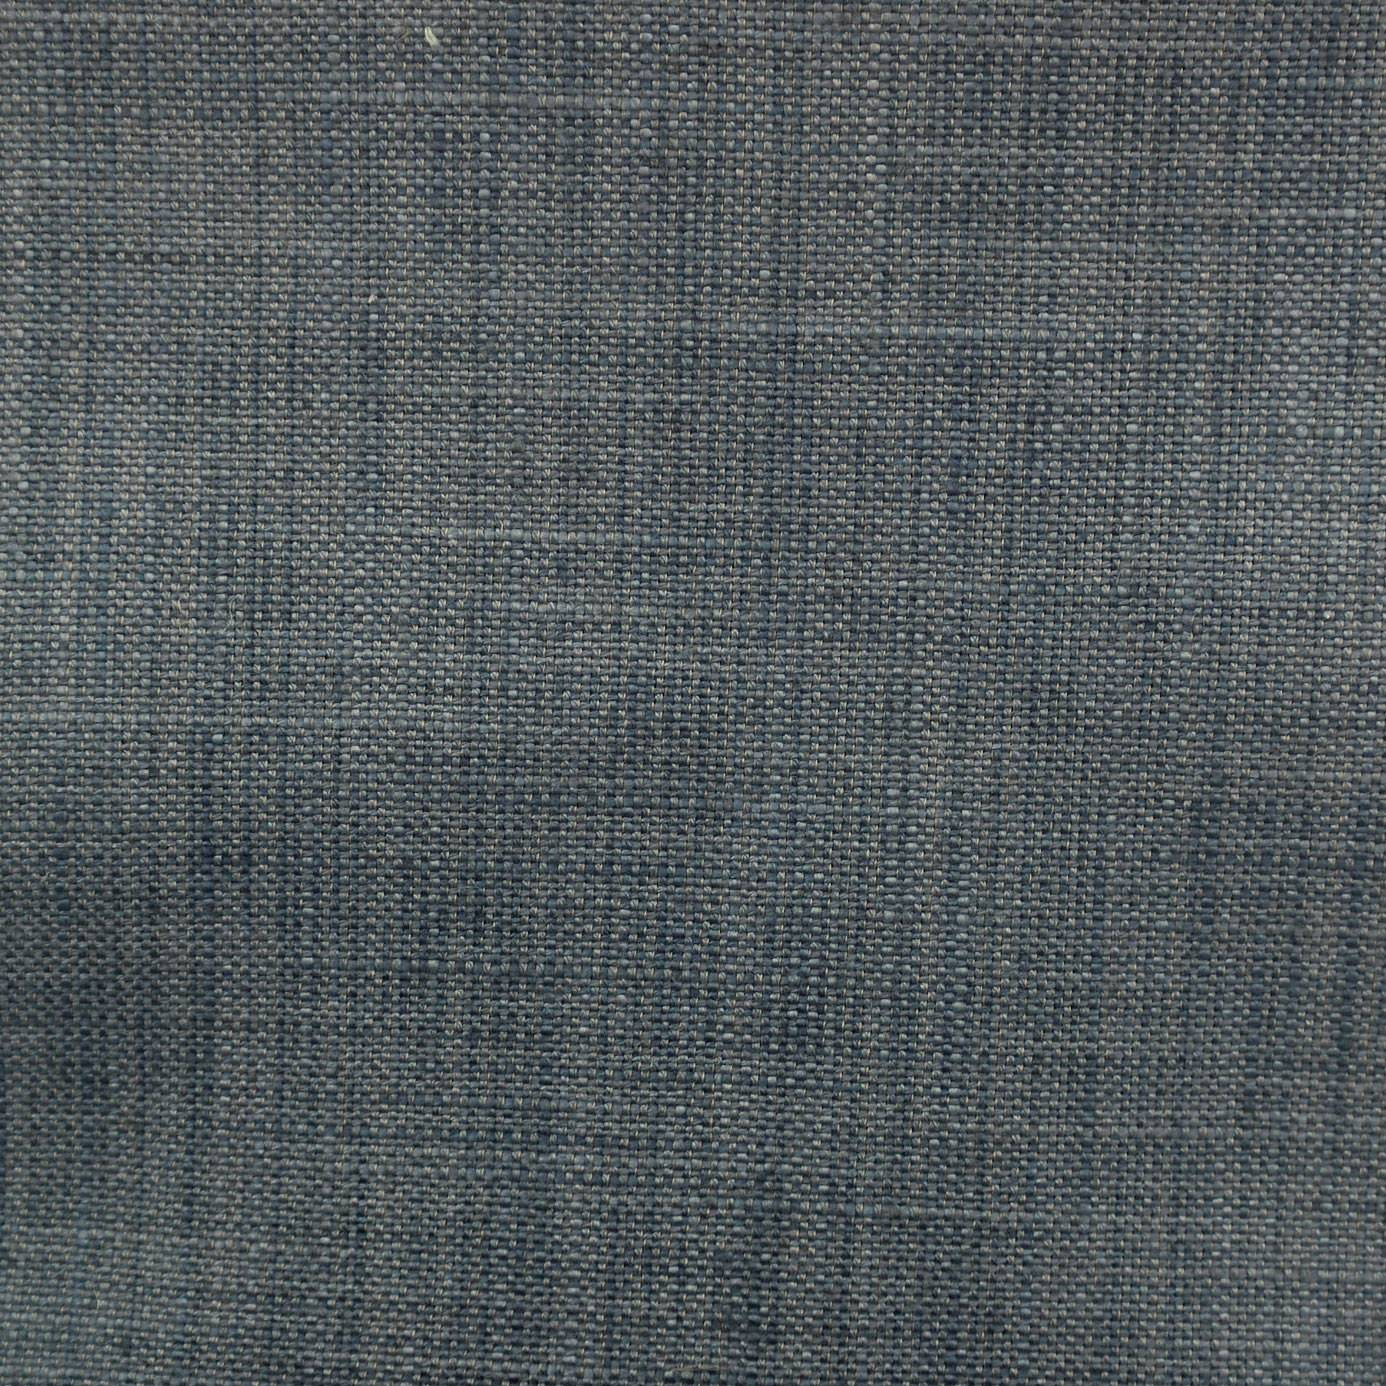 Curtains in malmo fabric chambray 2054 75 villa nova for Chambray fabric